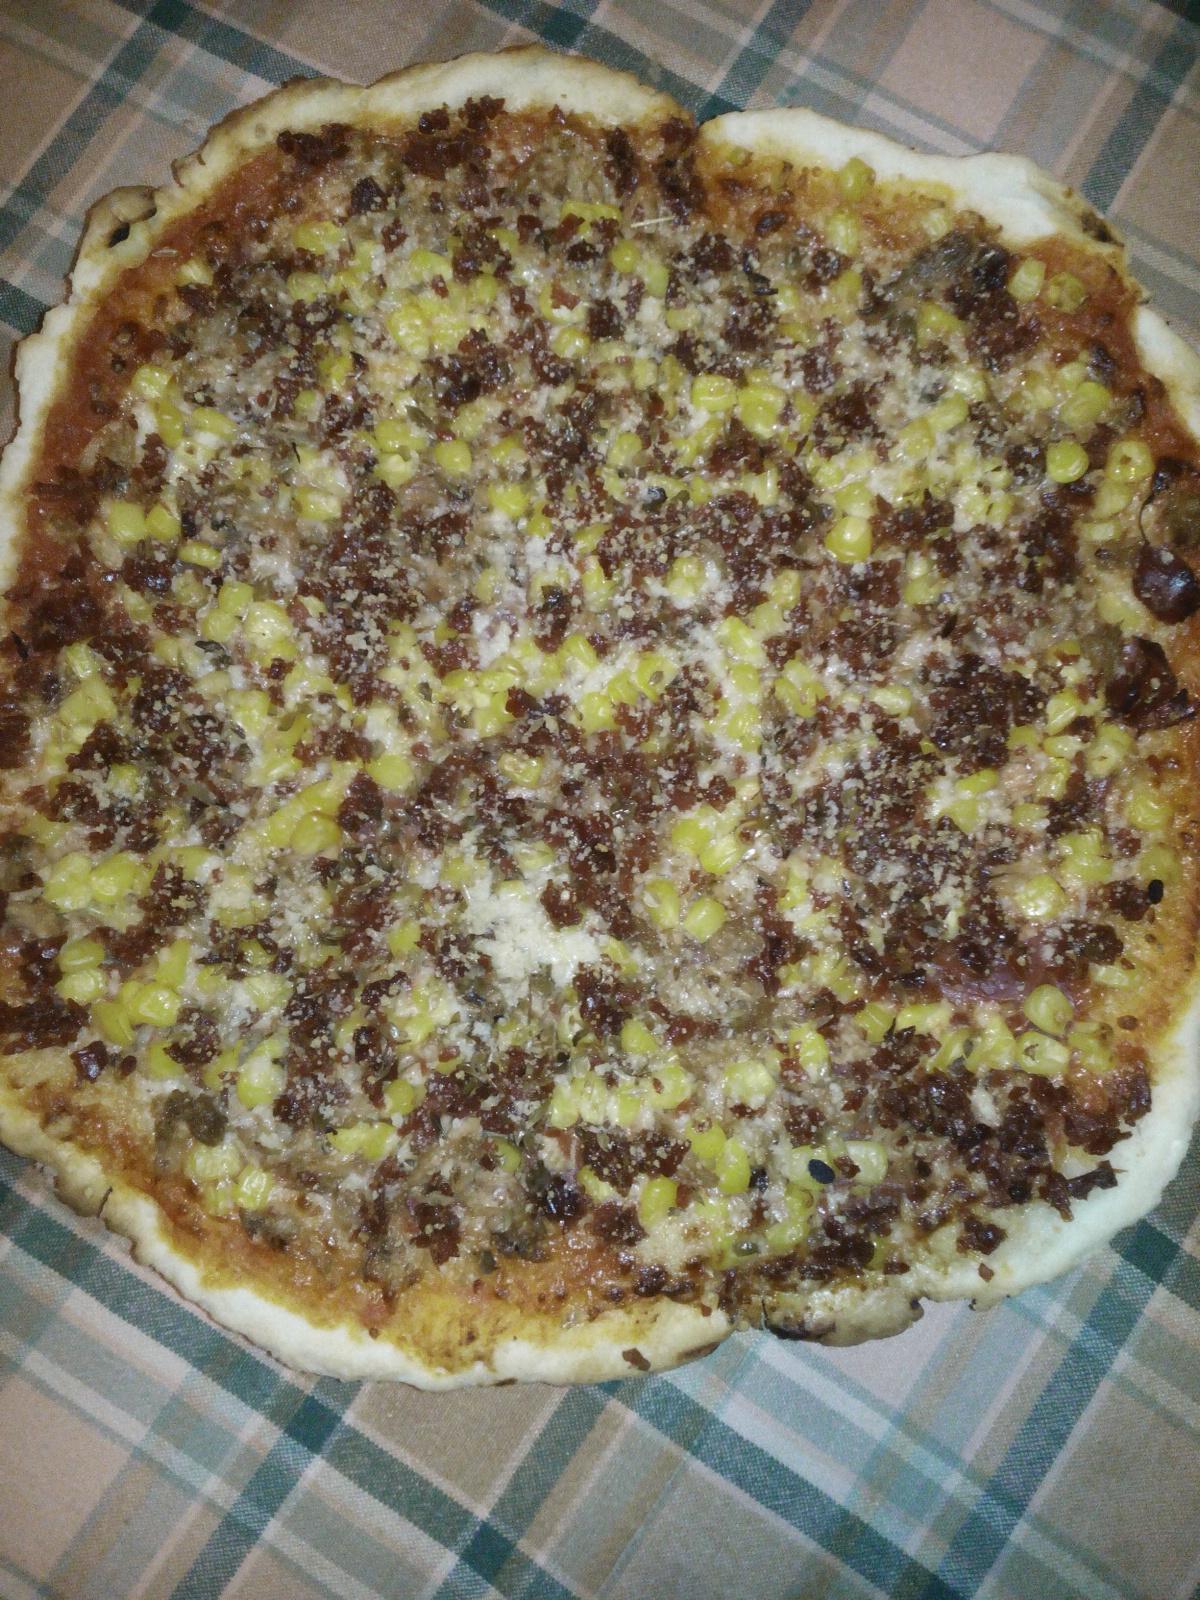 Masa de pizza o chapata. Sin gluten, Vegetariana, Vegana.